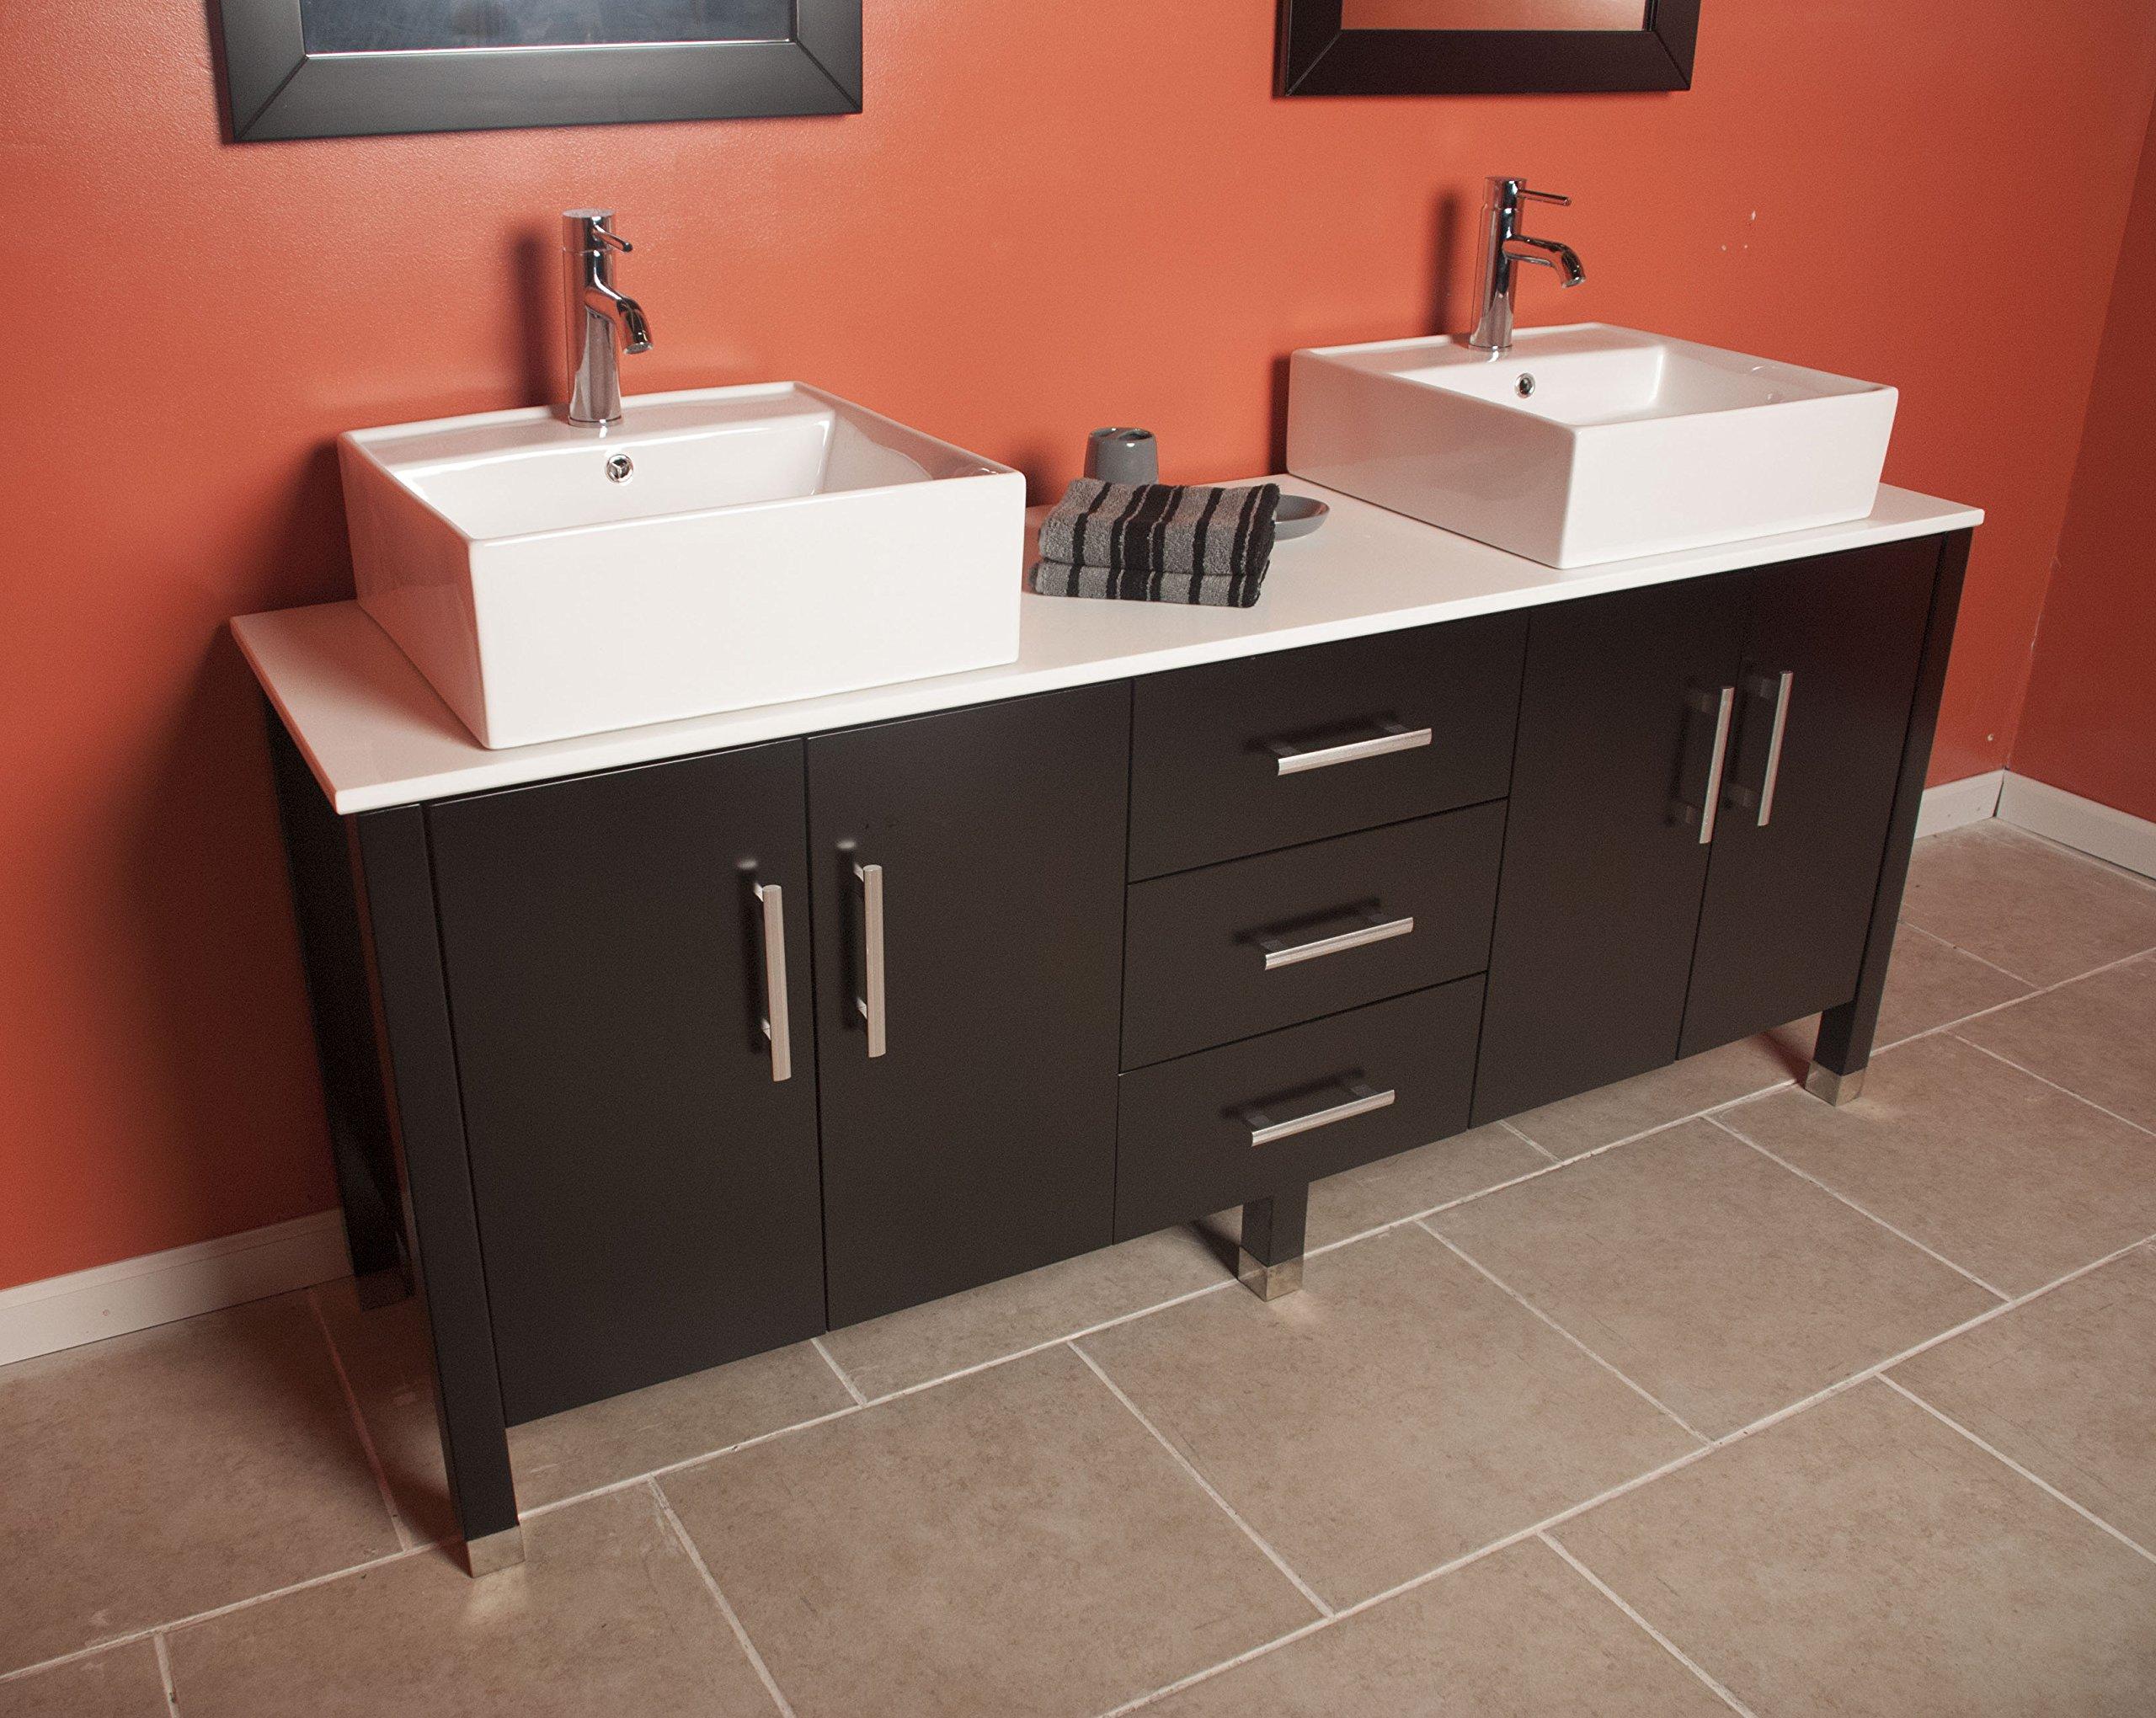 71 Inch Espresso Wood & Porcelain Double Vessel Sink Bathroom Vanity Set- ''Pulaski'' (Chrome Faucets) by The Tub Connection